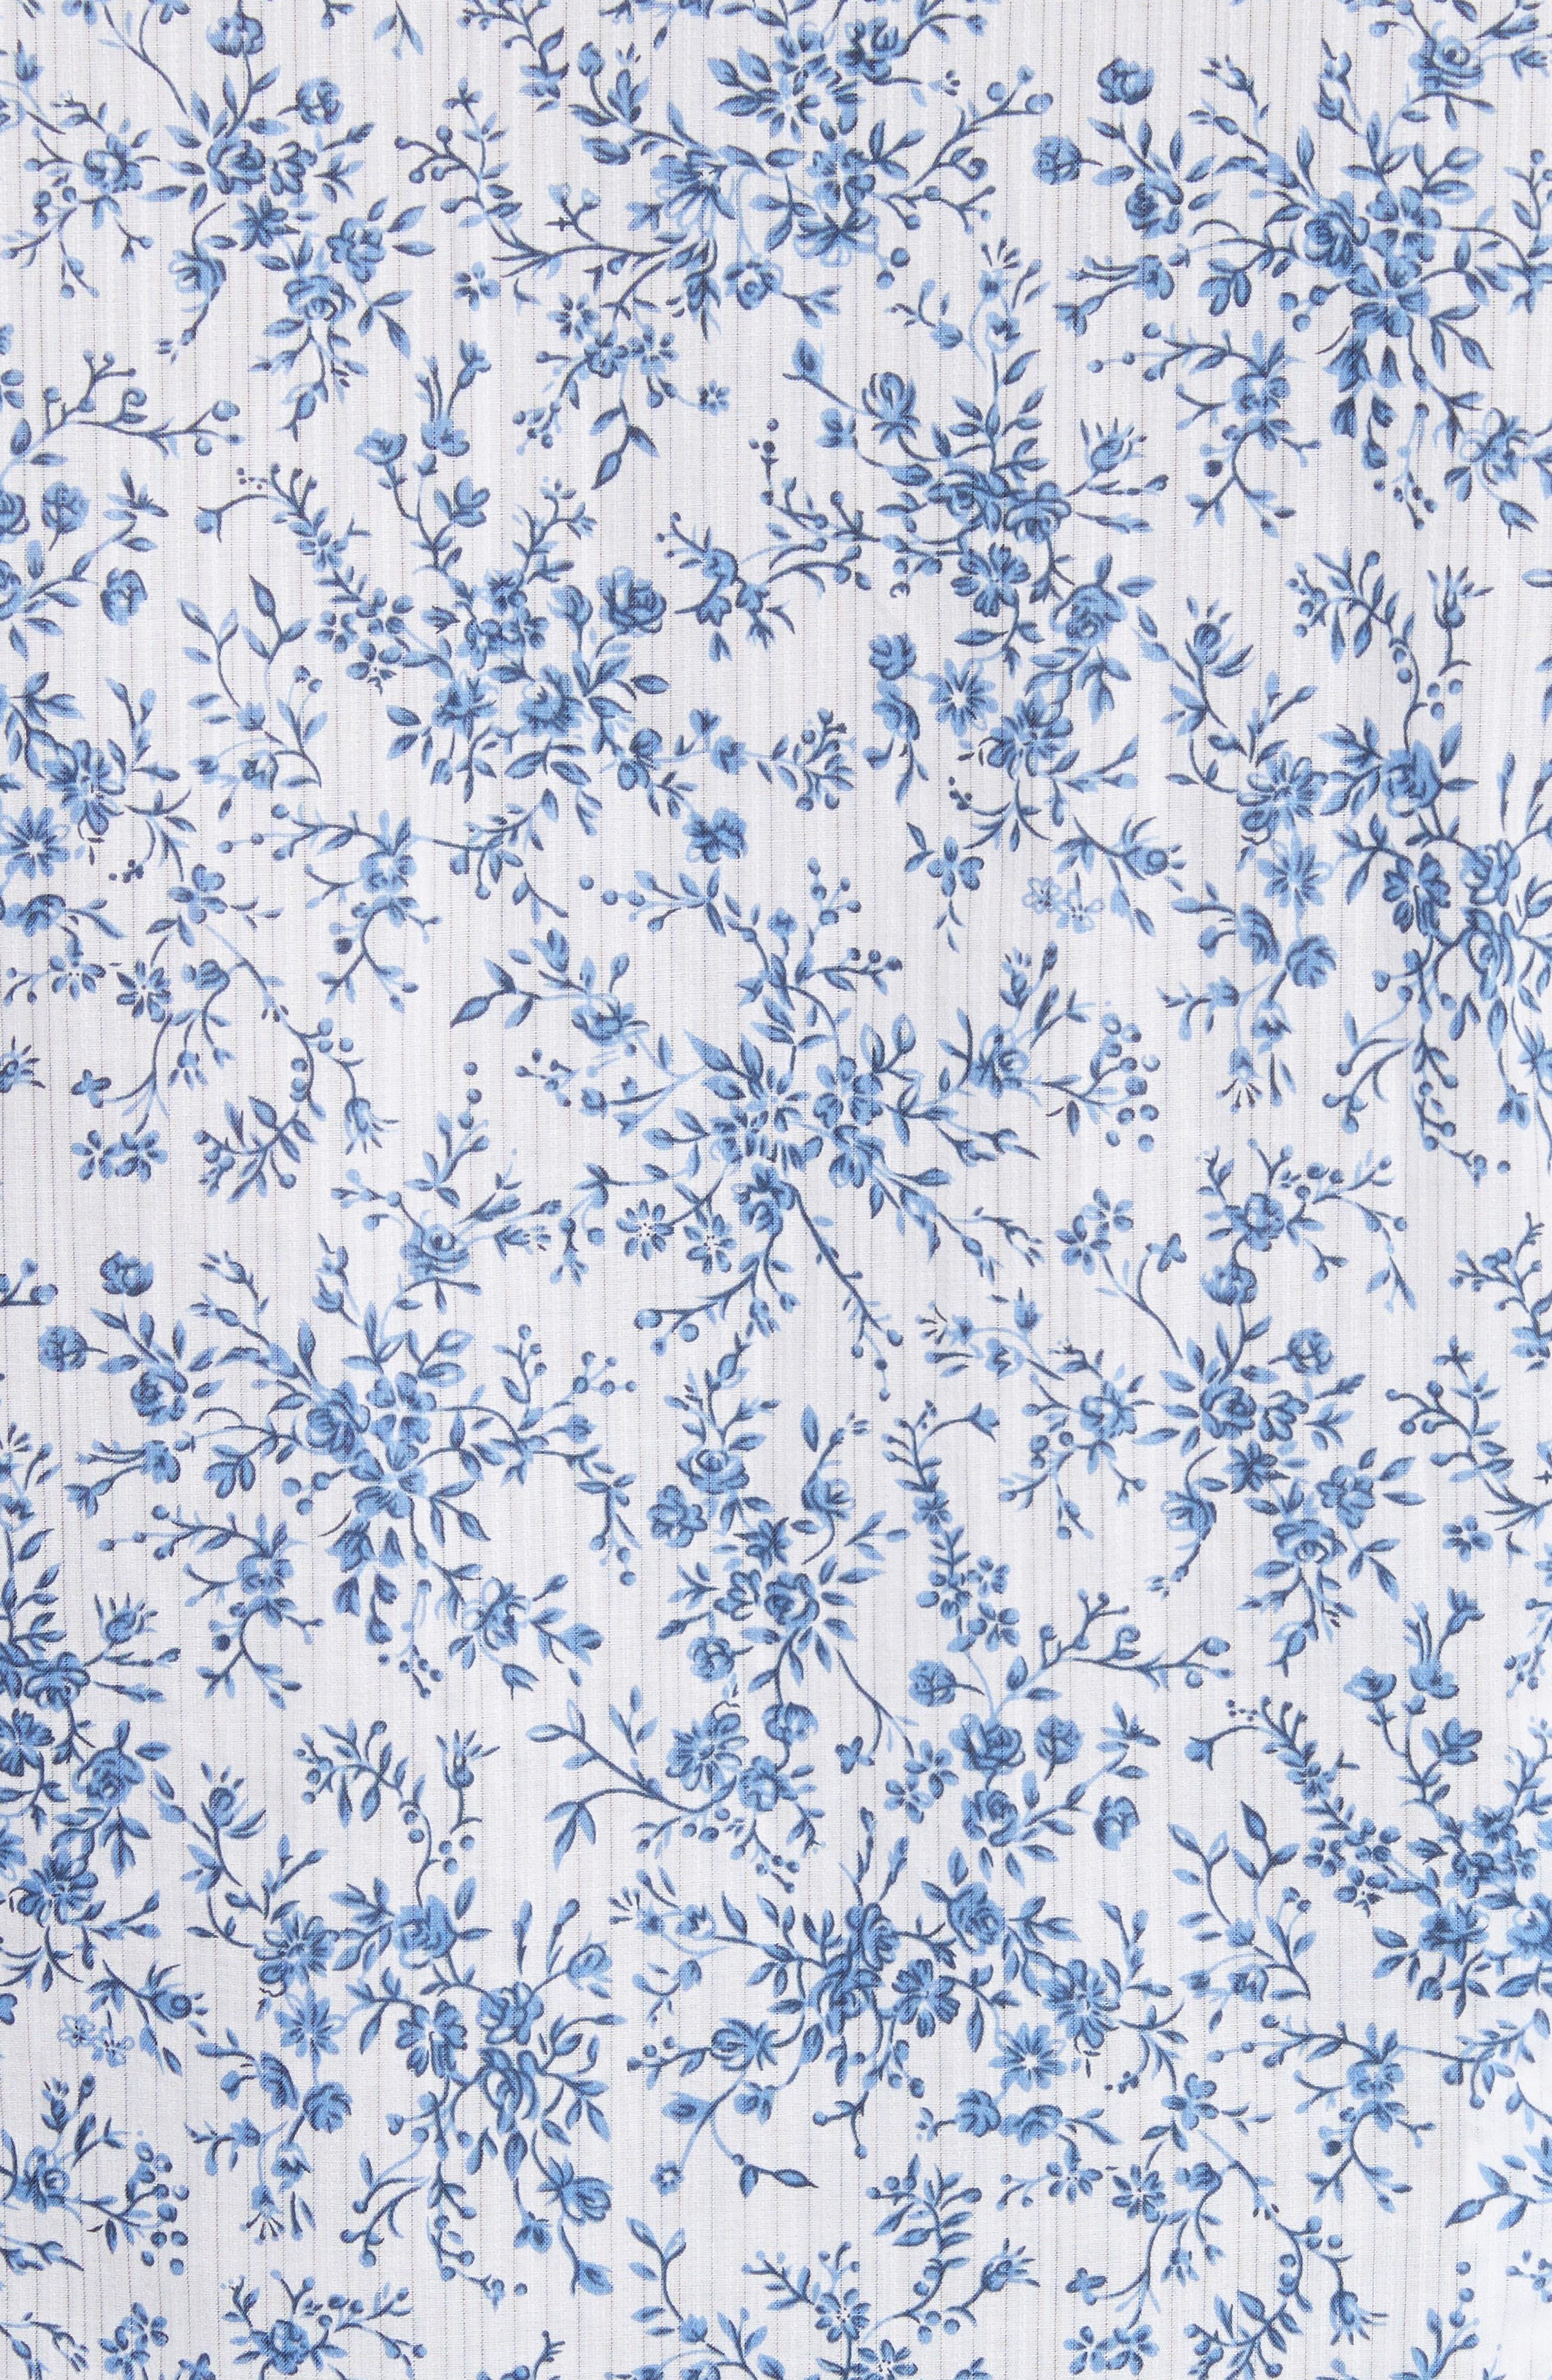 John Varvatos Slim Fit Floral Print Shirt,                             Alternate thumbnail 5, color,                             448